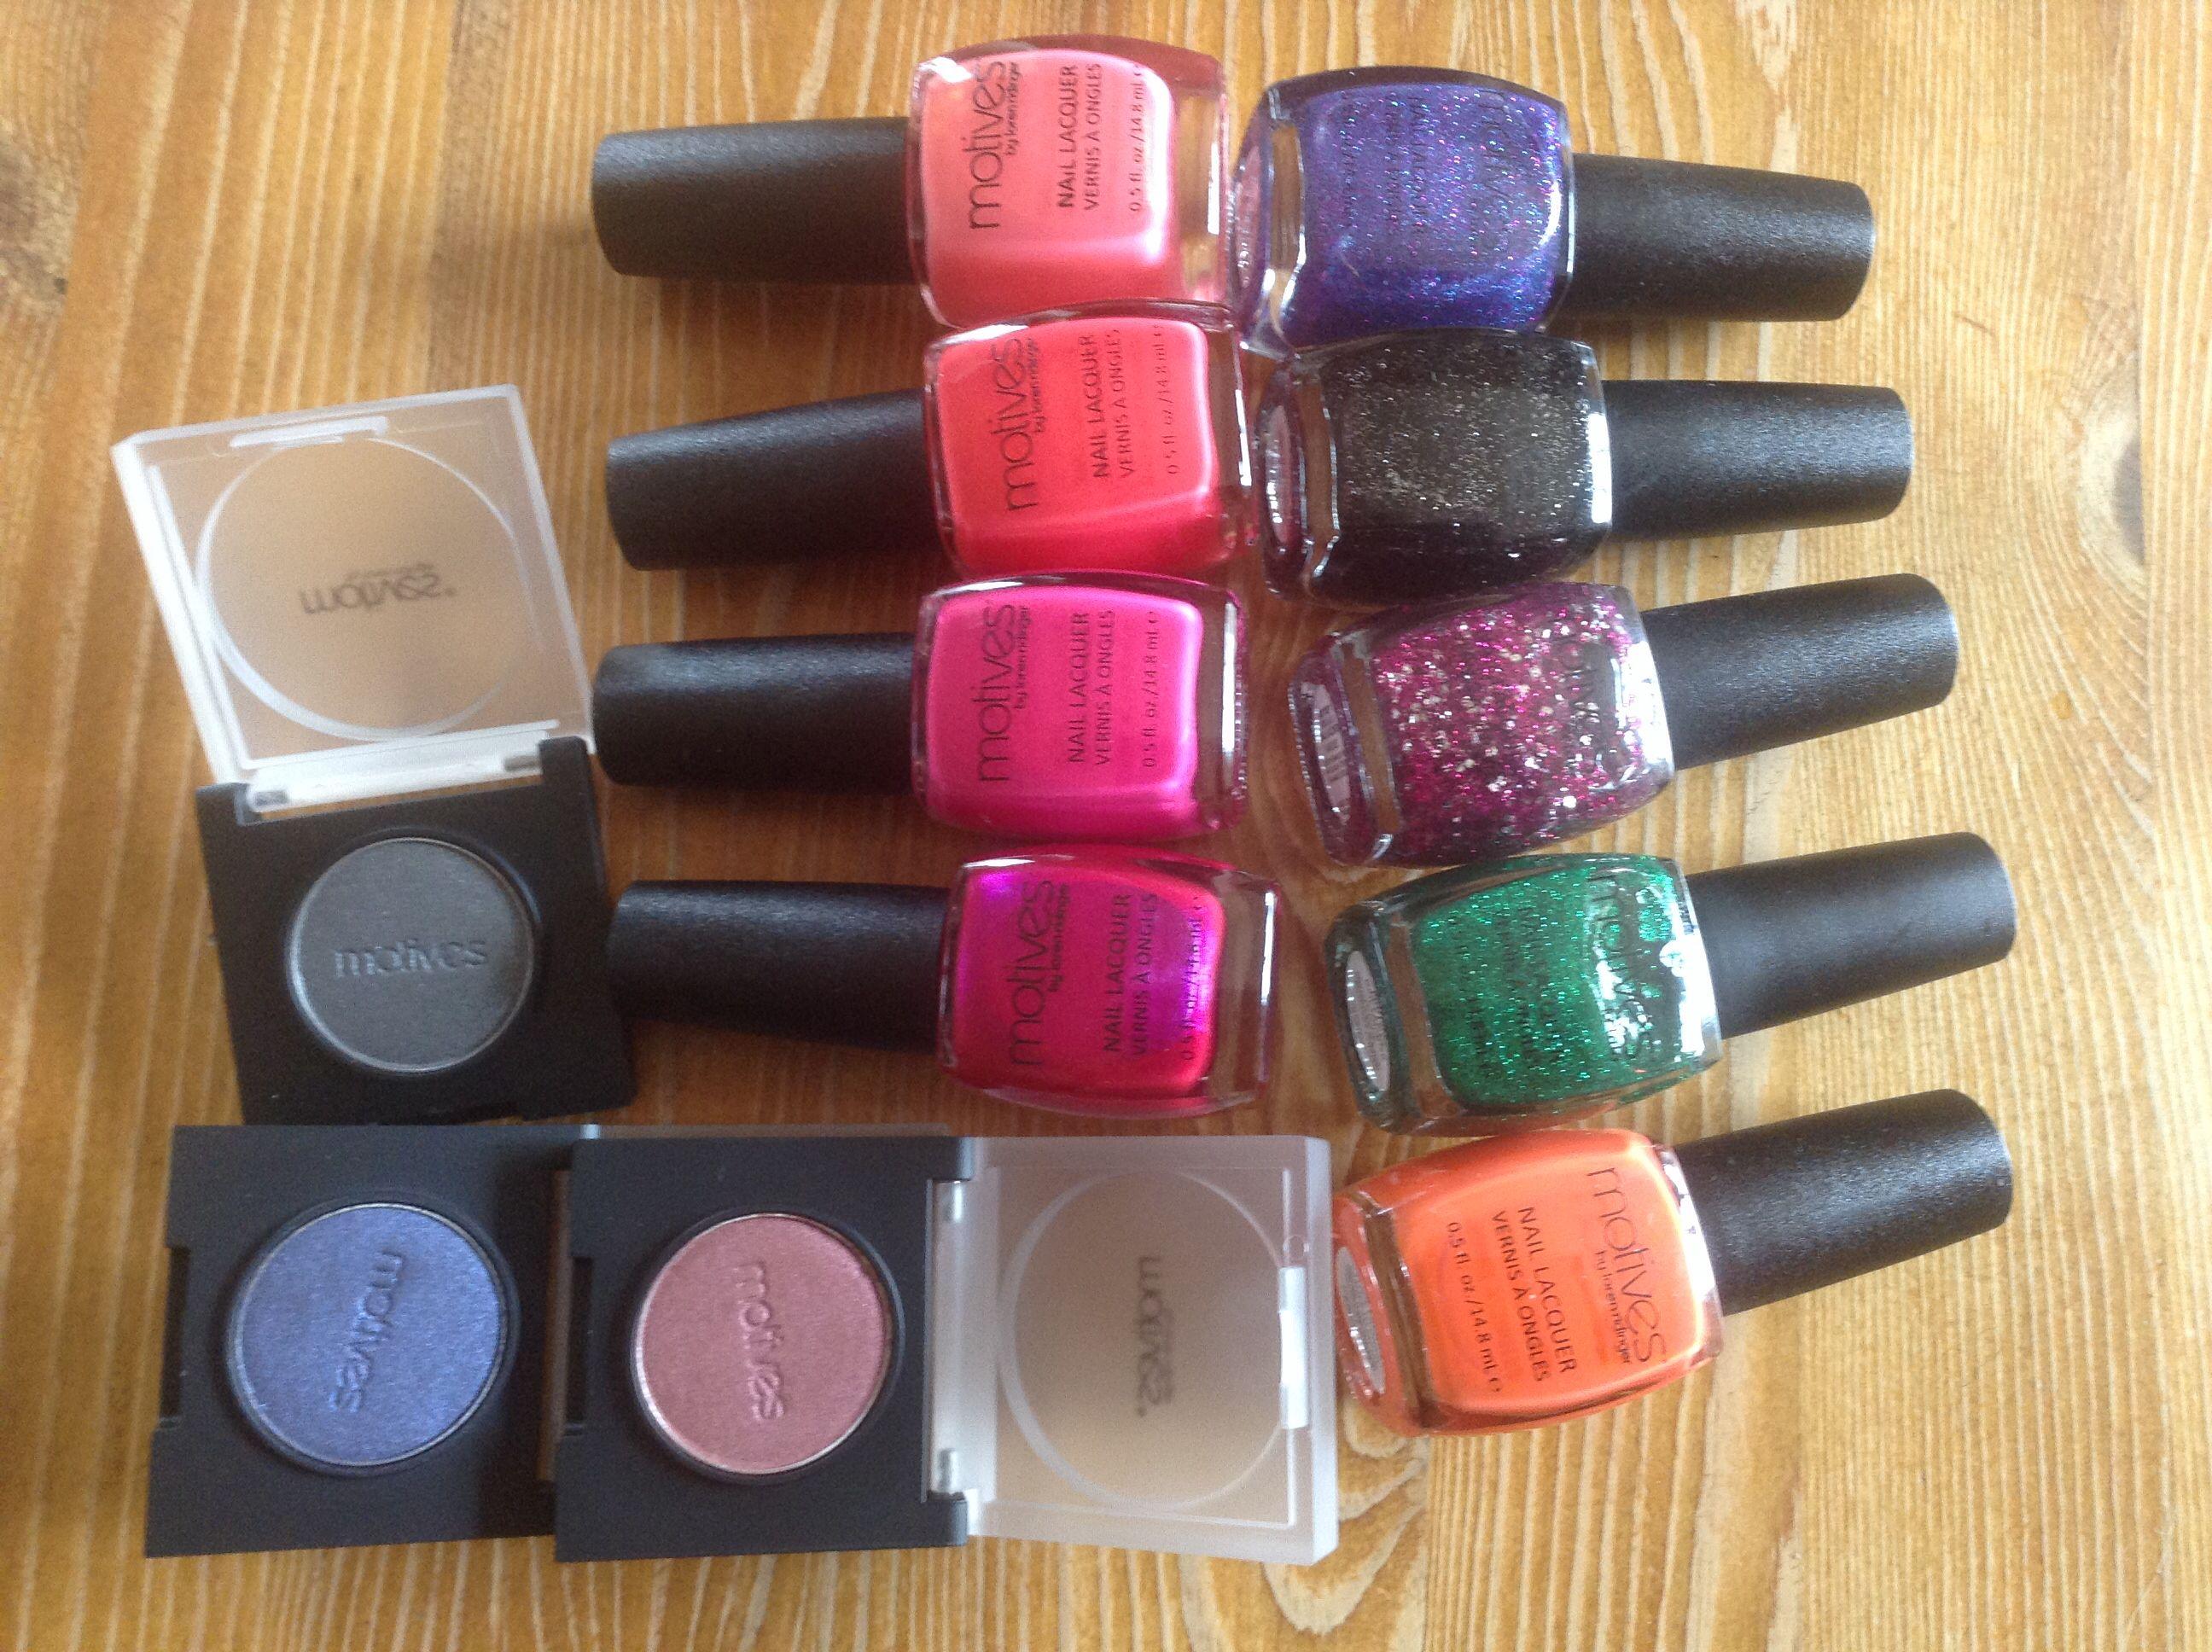 Motives nail lacquers and eyeshadows | Motives cosmetics by La La ...